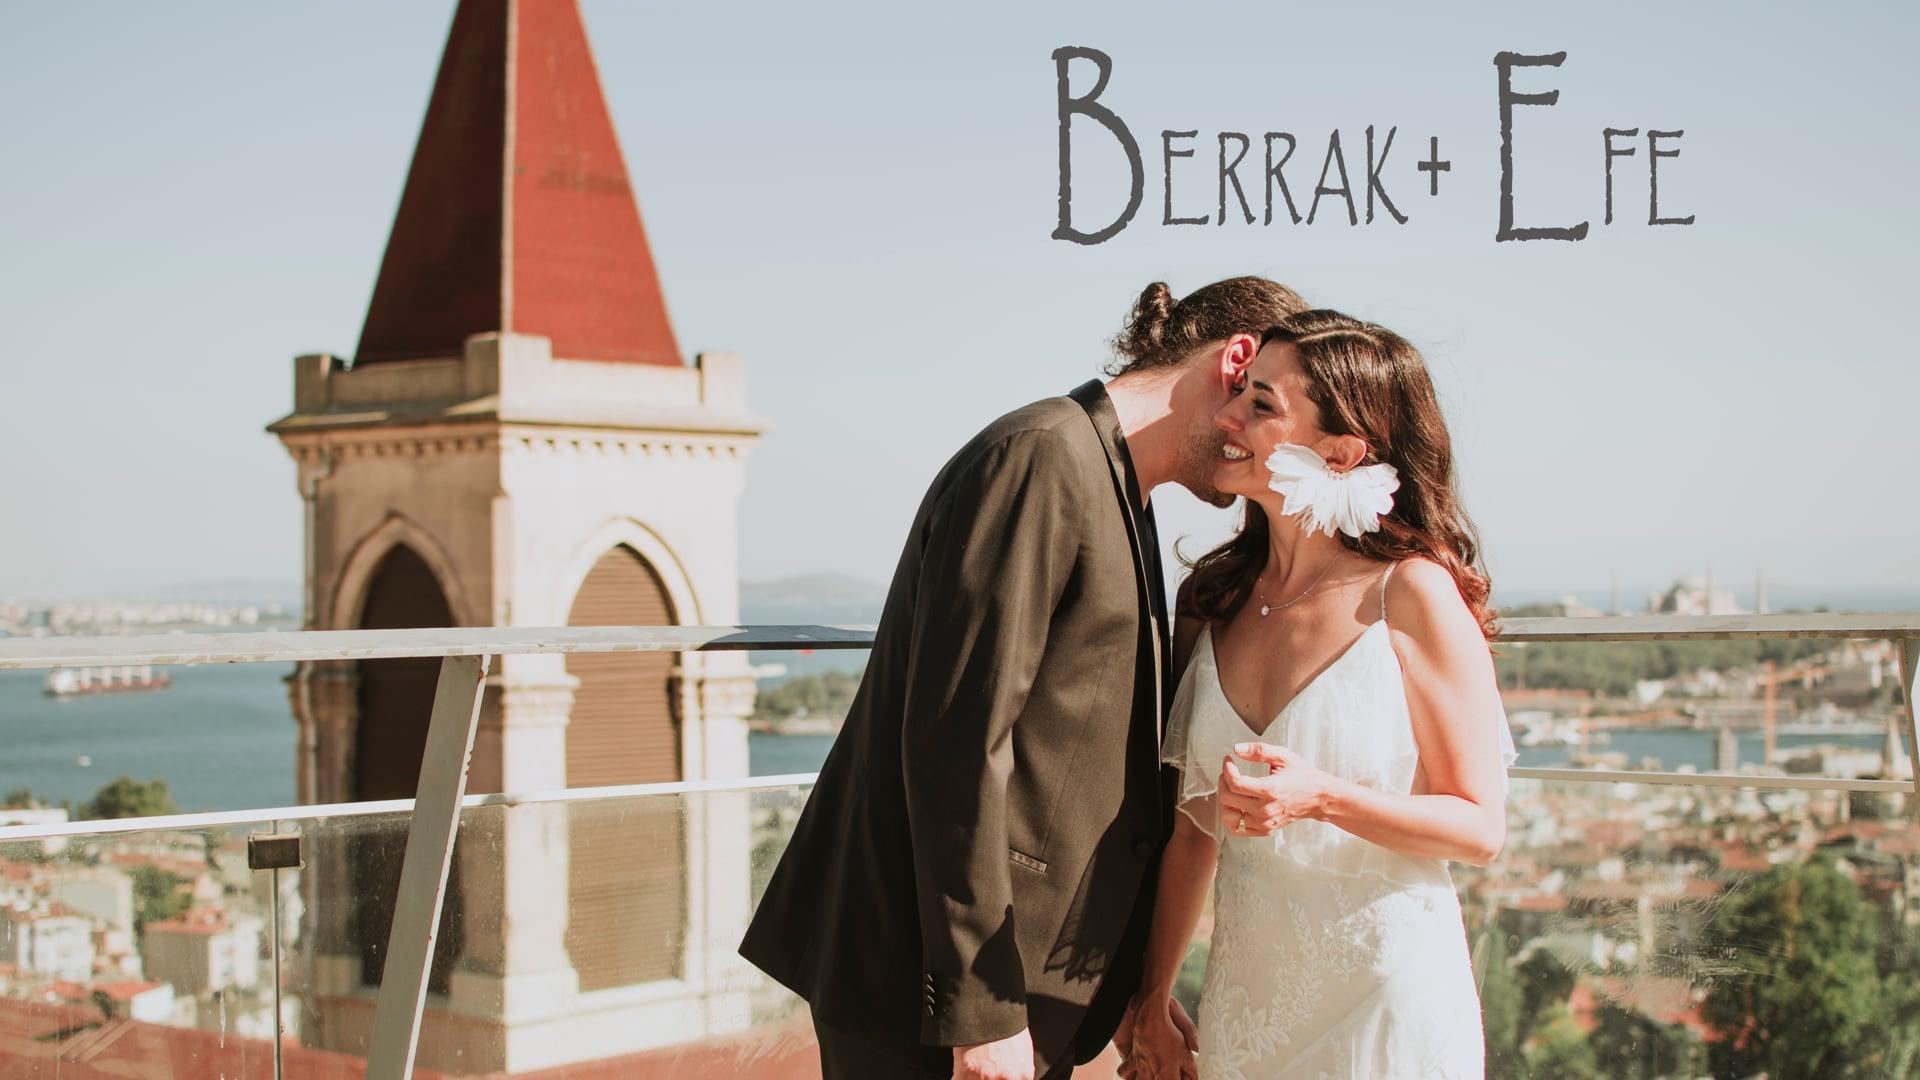 Berrak + Efe Wedding   360 İstanbul Beyoğlu